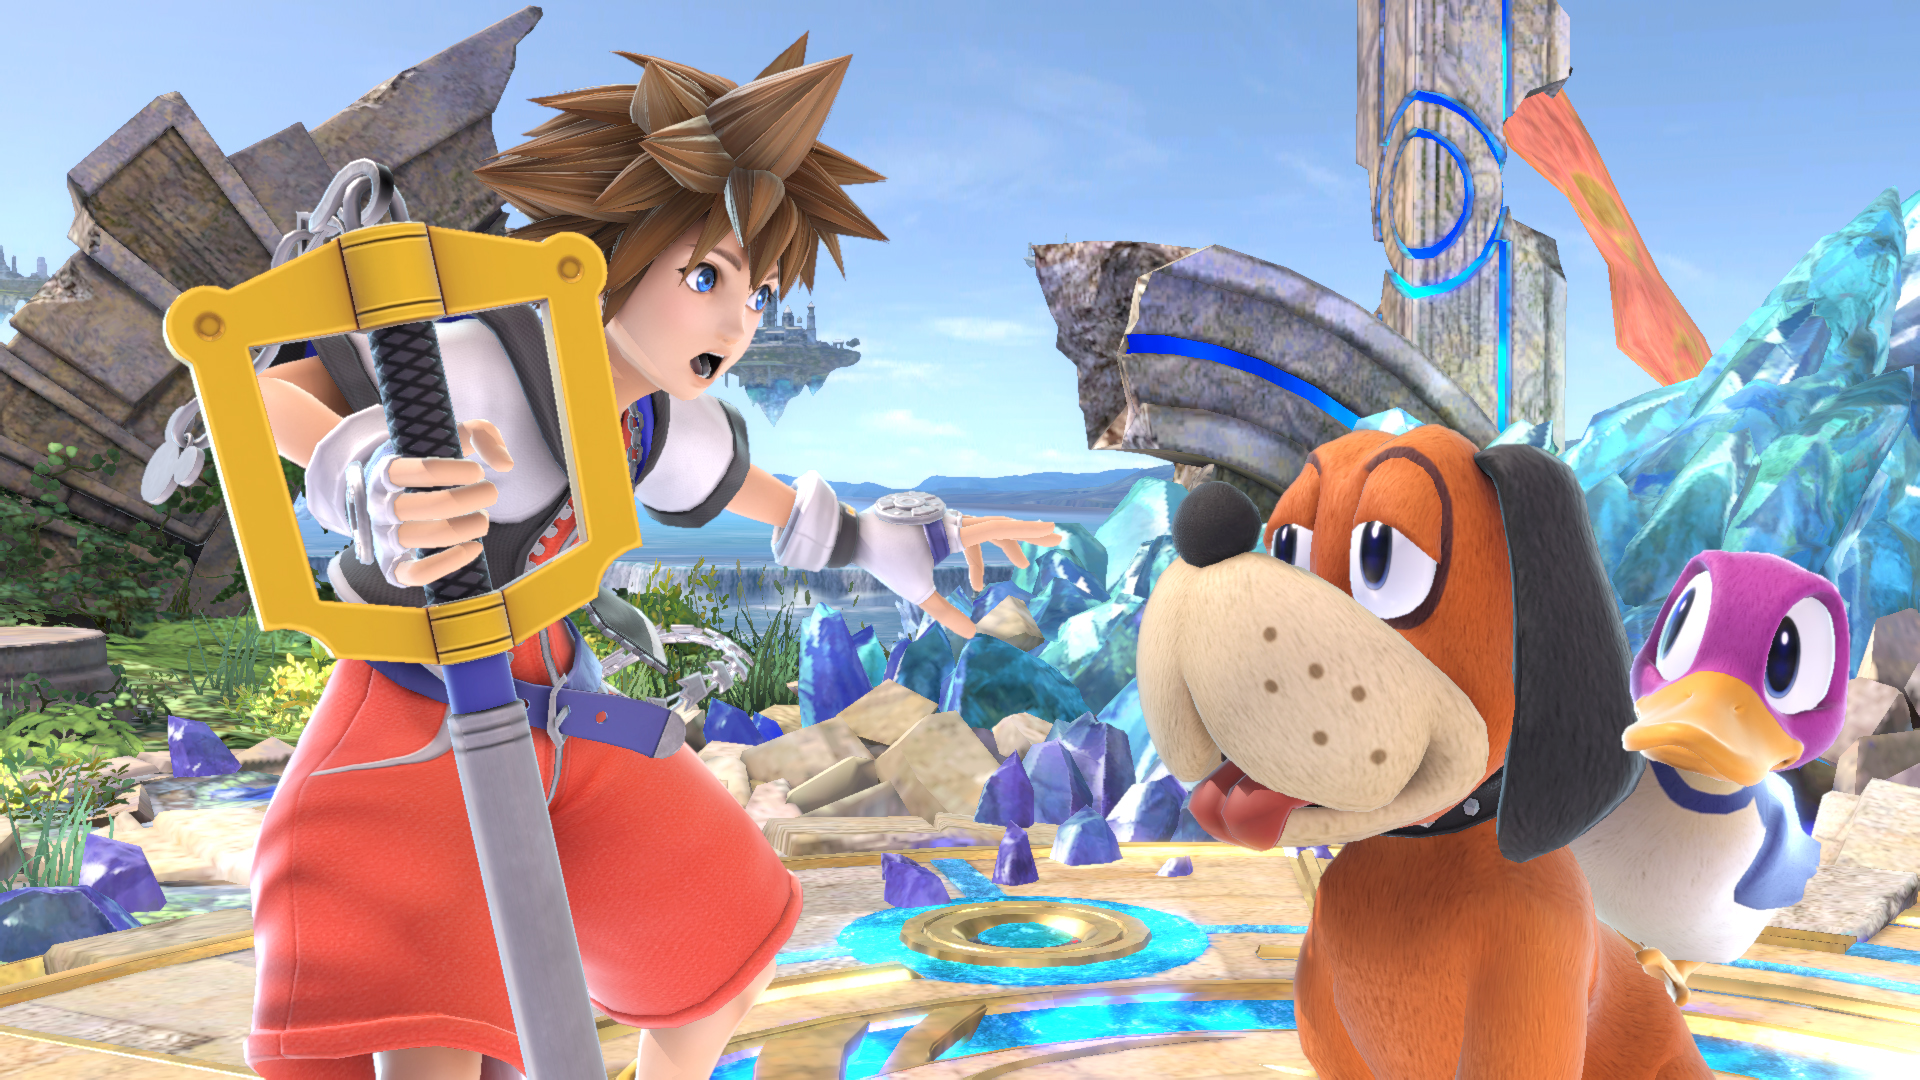 Sora and Duck Hunt in Super Smash Bros. Ultimate